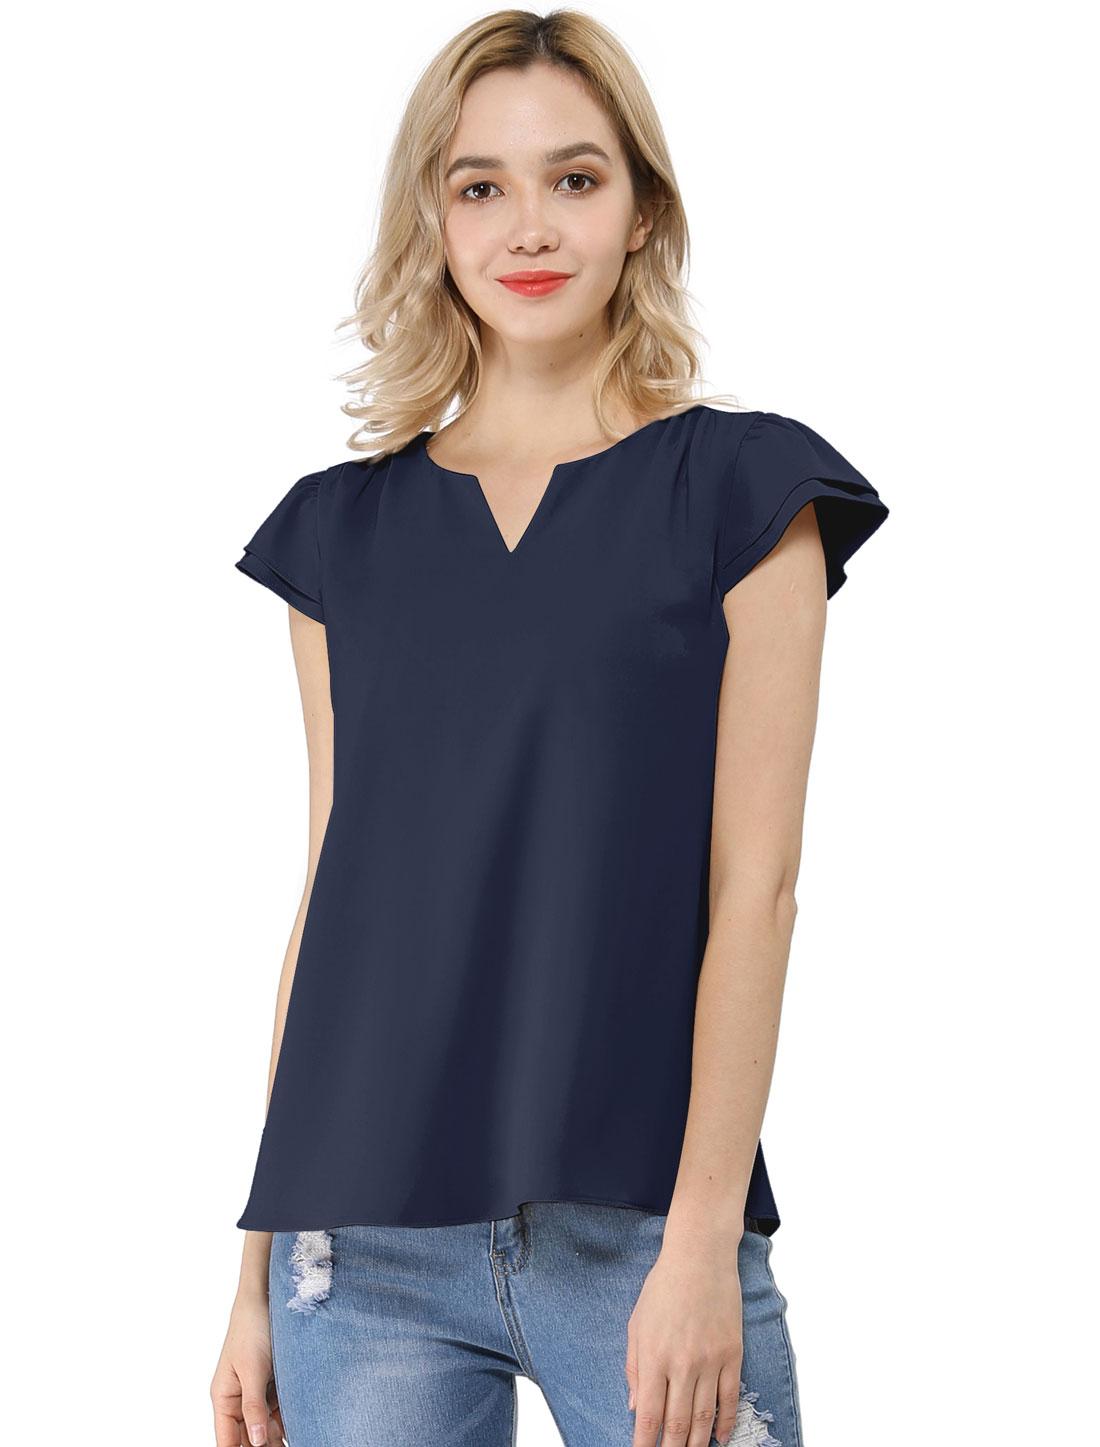 Allegra K Women's Work Business Casual Cap Sleeve Blouse Dark Blue S